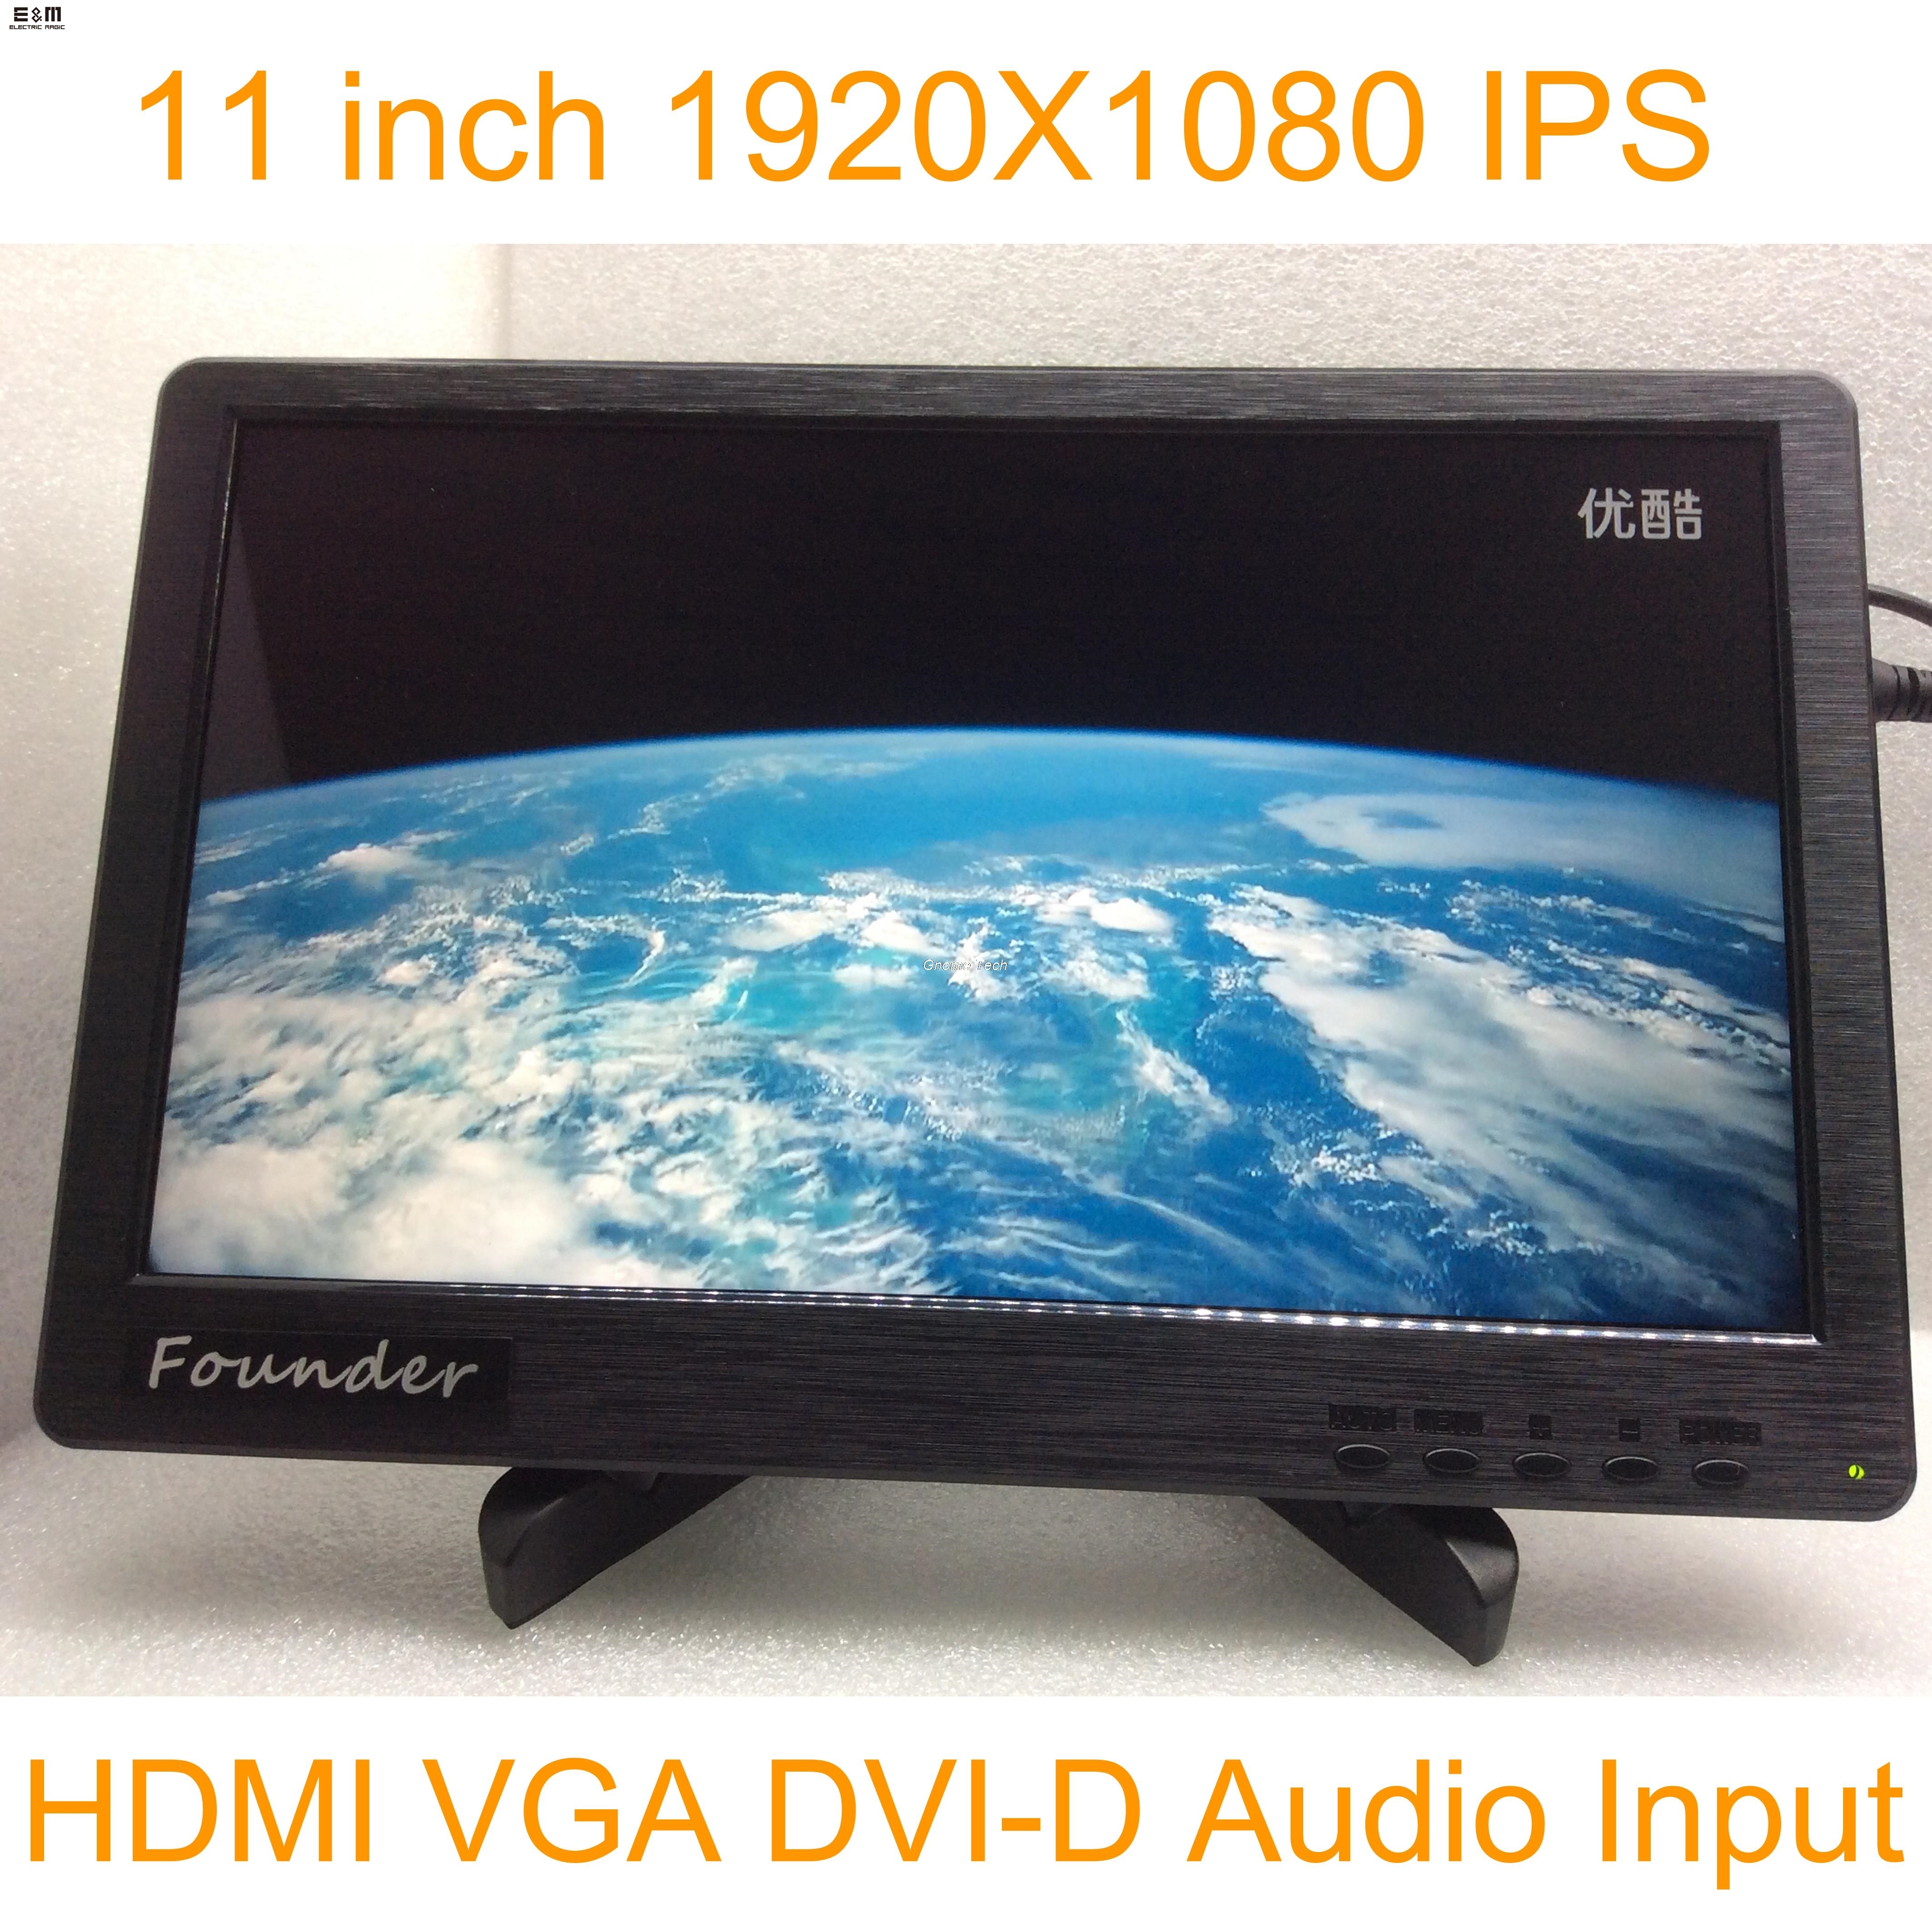 E&M 11 inch 1920*1080 Screen with Speaker Base IPS LCD Monitor Display HDMI VGA DVI Game Xbox PS4 Raspberry Pi 3 1080p